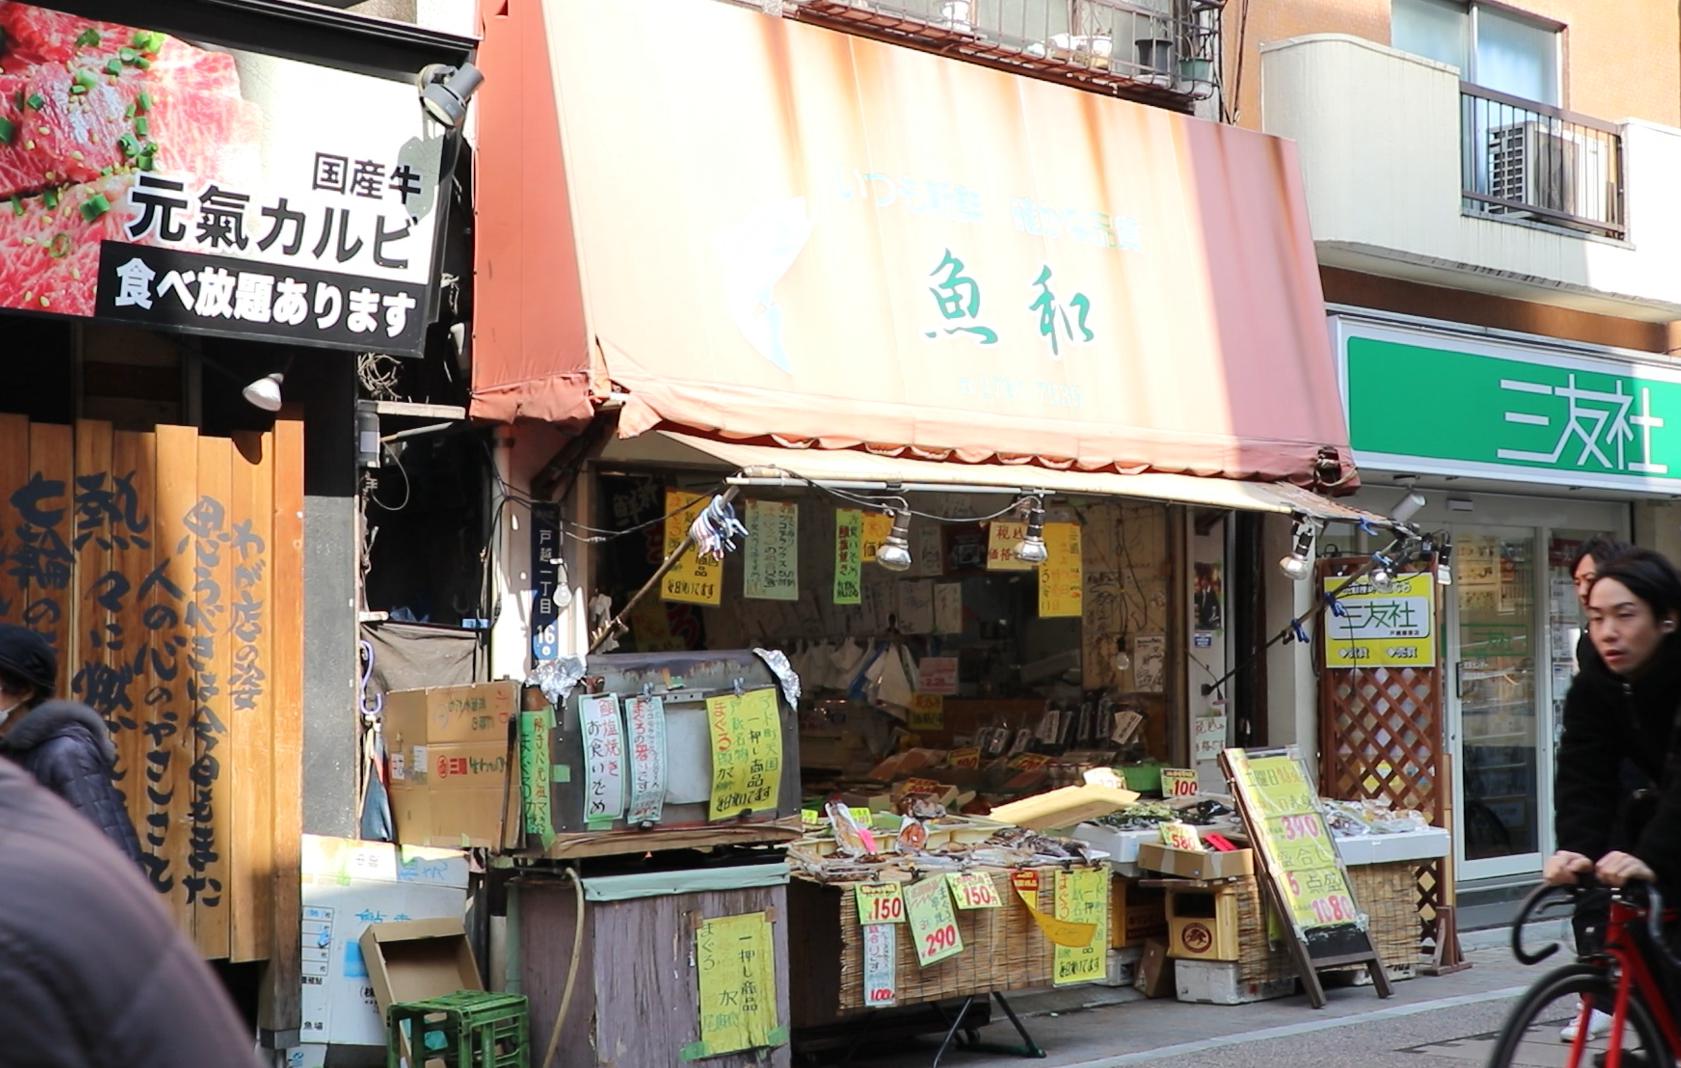 Tokyo Street Food Tour fish uokazu